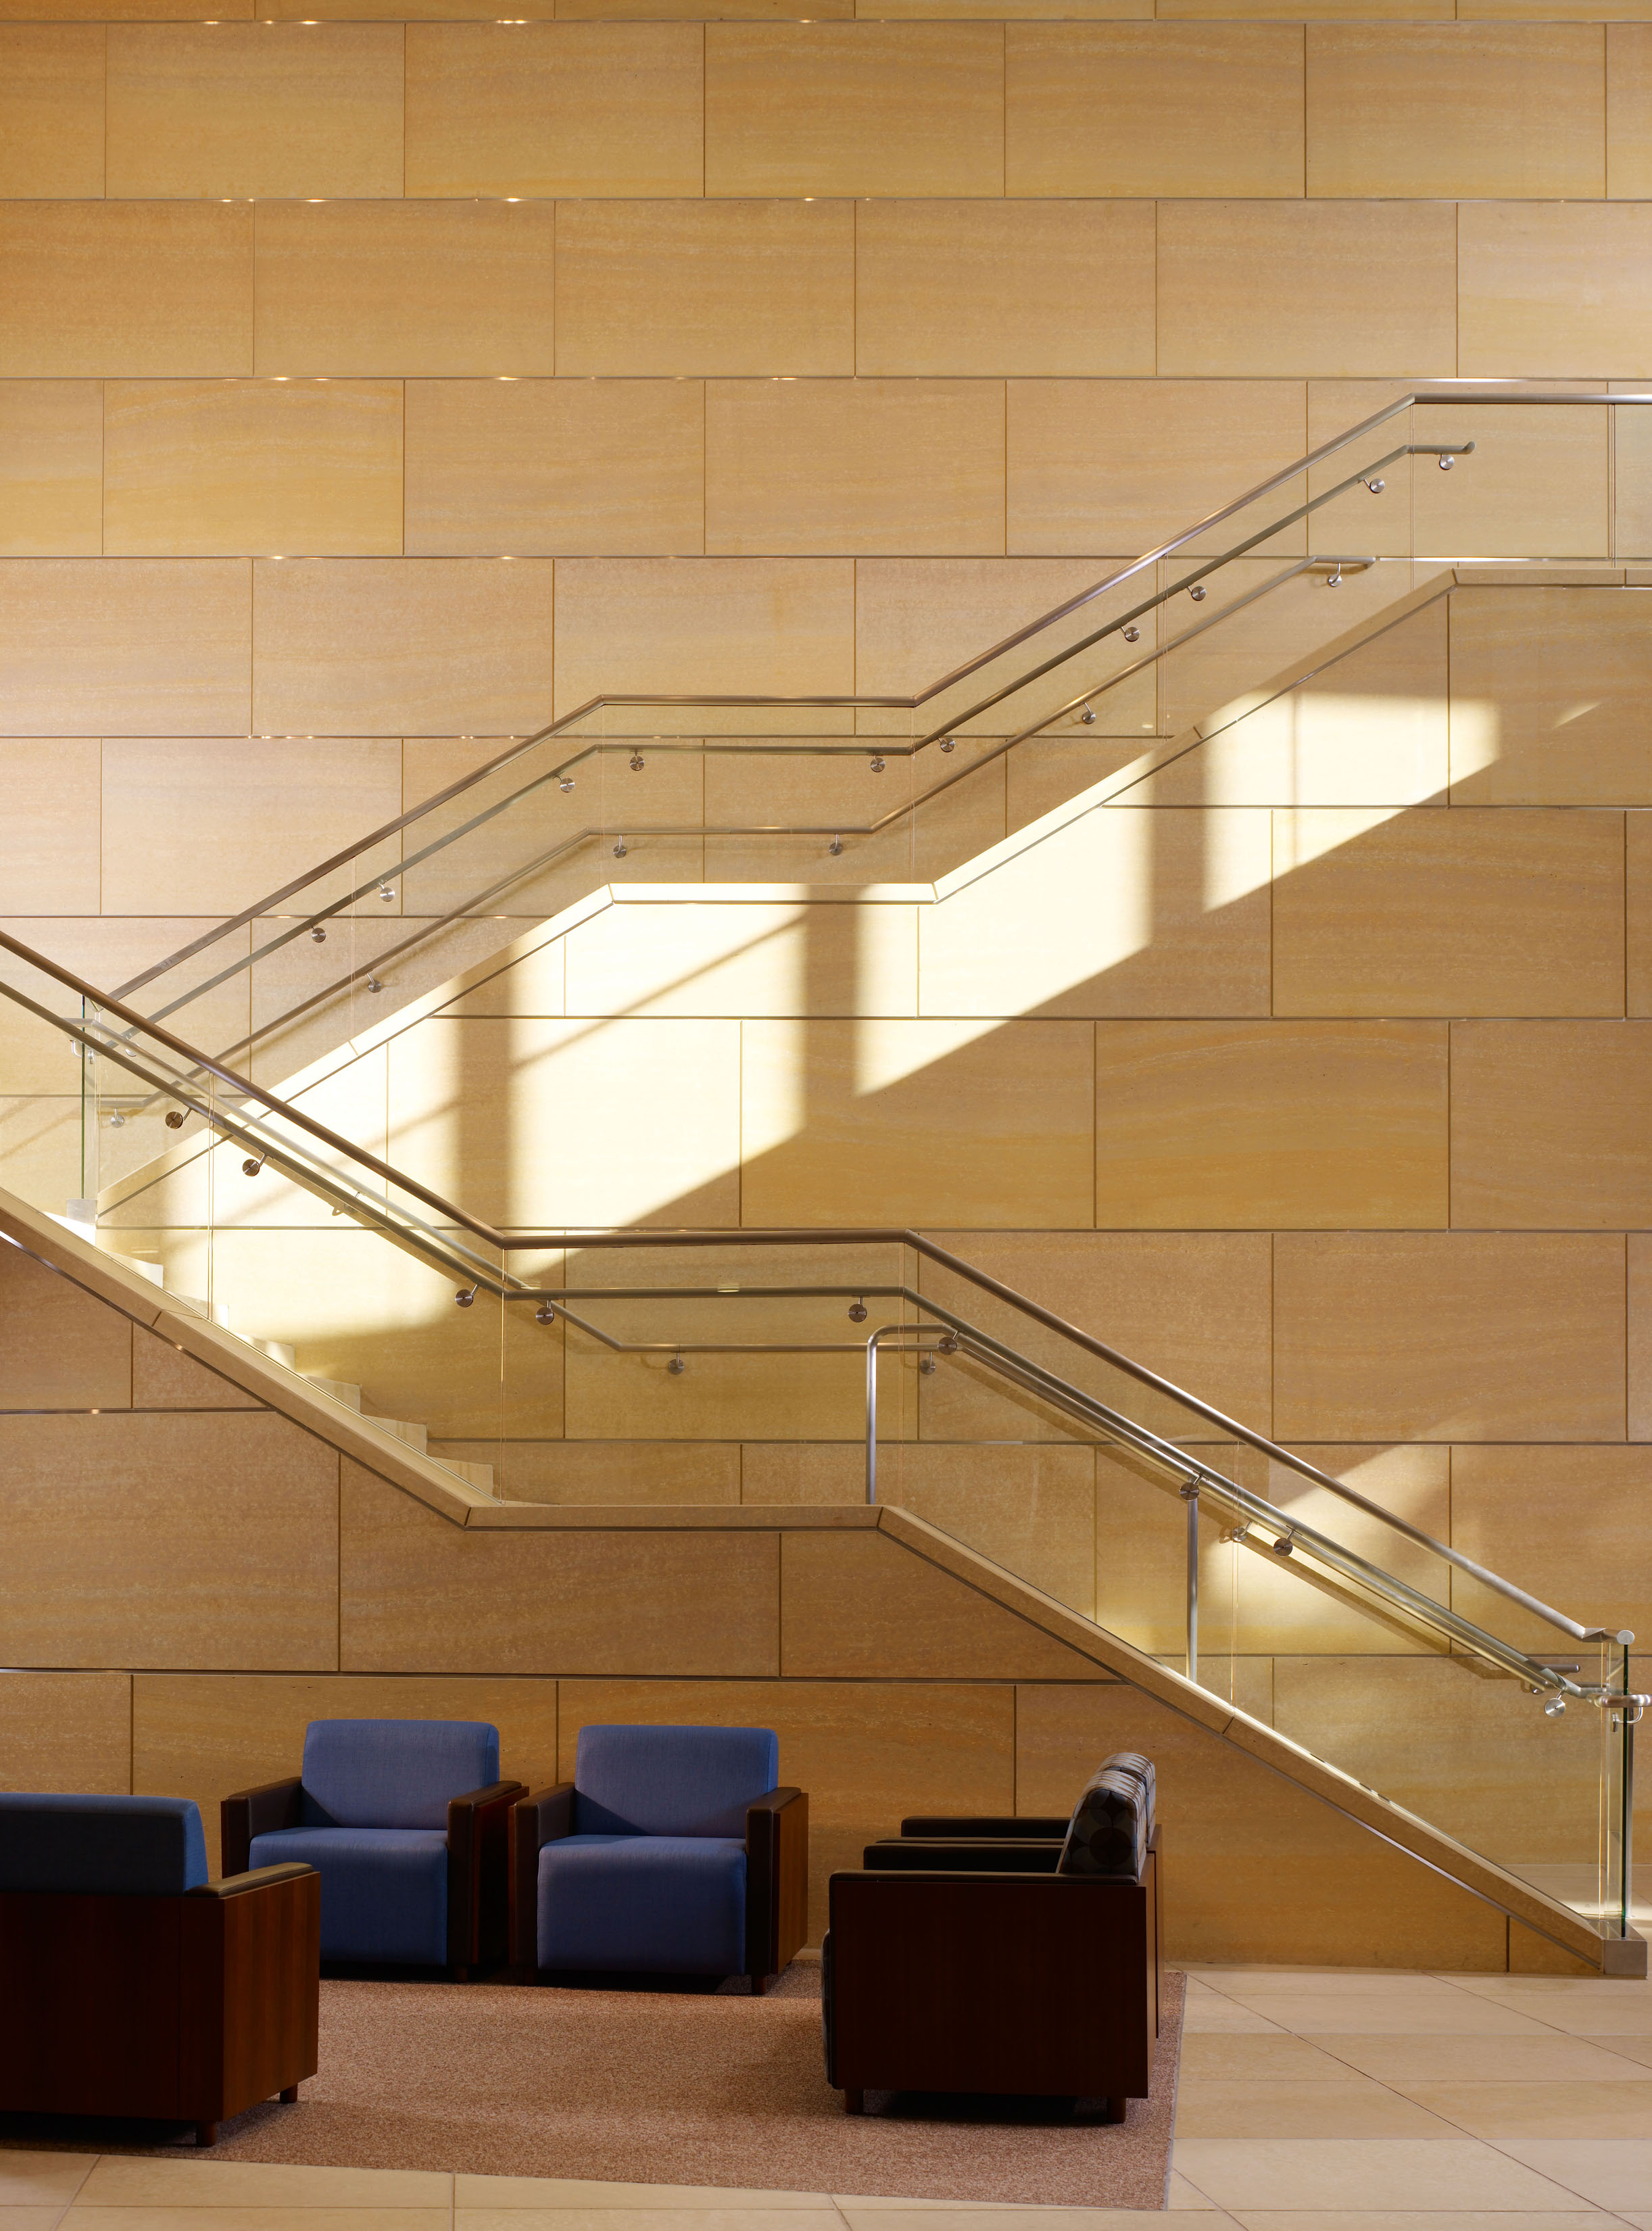 UCIrvine Douglas Hospital Interior - Lobby 03.jpg